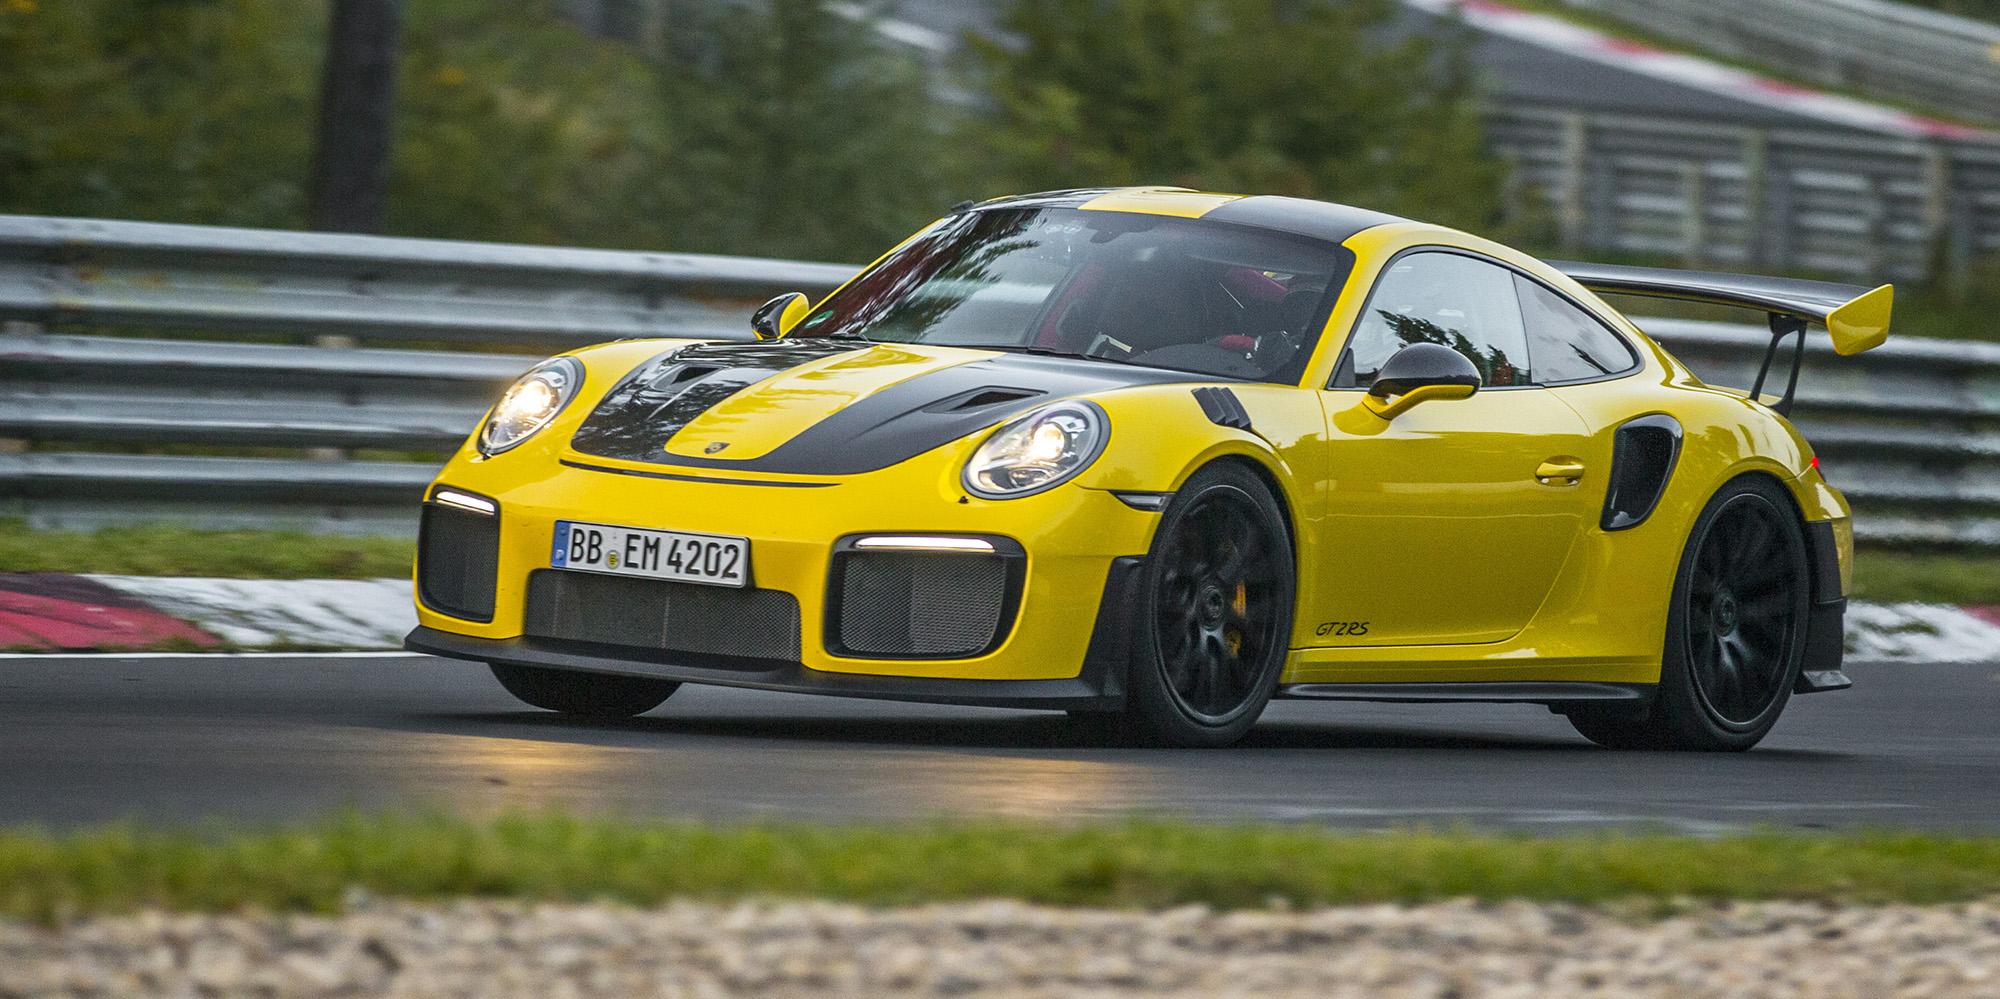 porsche-911-gt2-rs-nurburgring-record-P17_0909_a3_rgb Outstanding Porsche 911 Gt2 Wheel Au Cars Trend